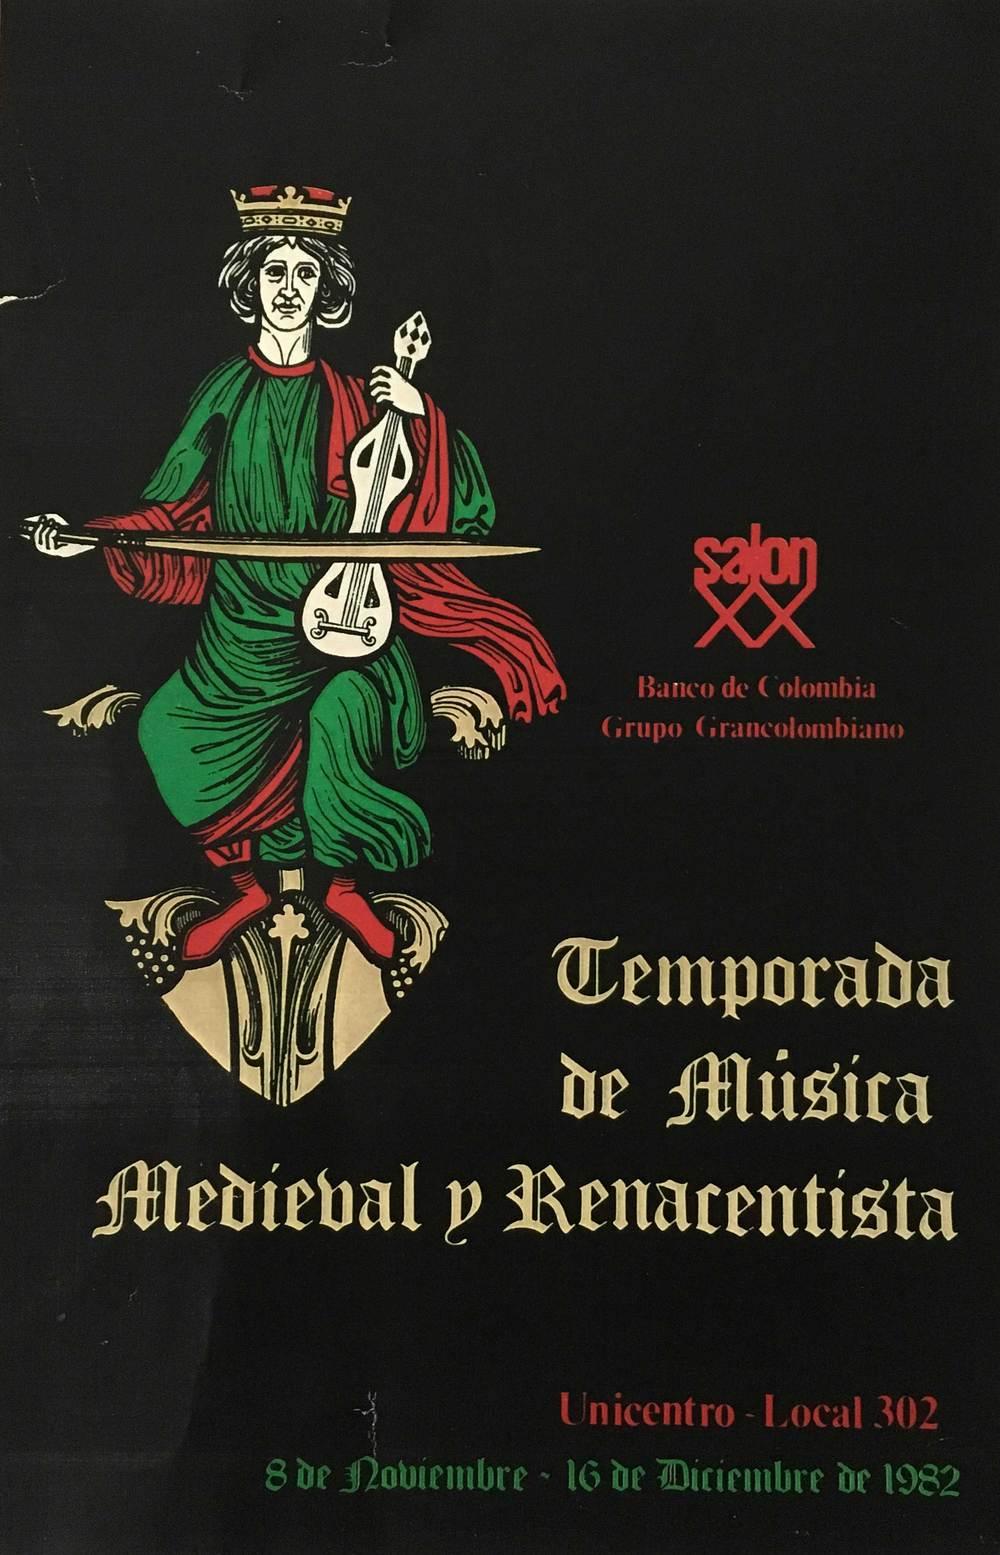 musica_medieval_y_renacentista_1.JPG